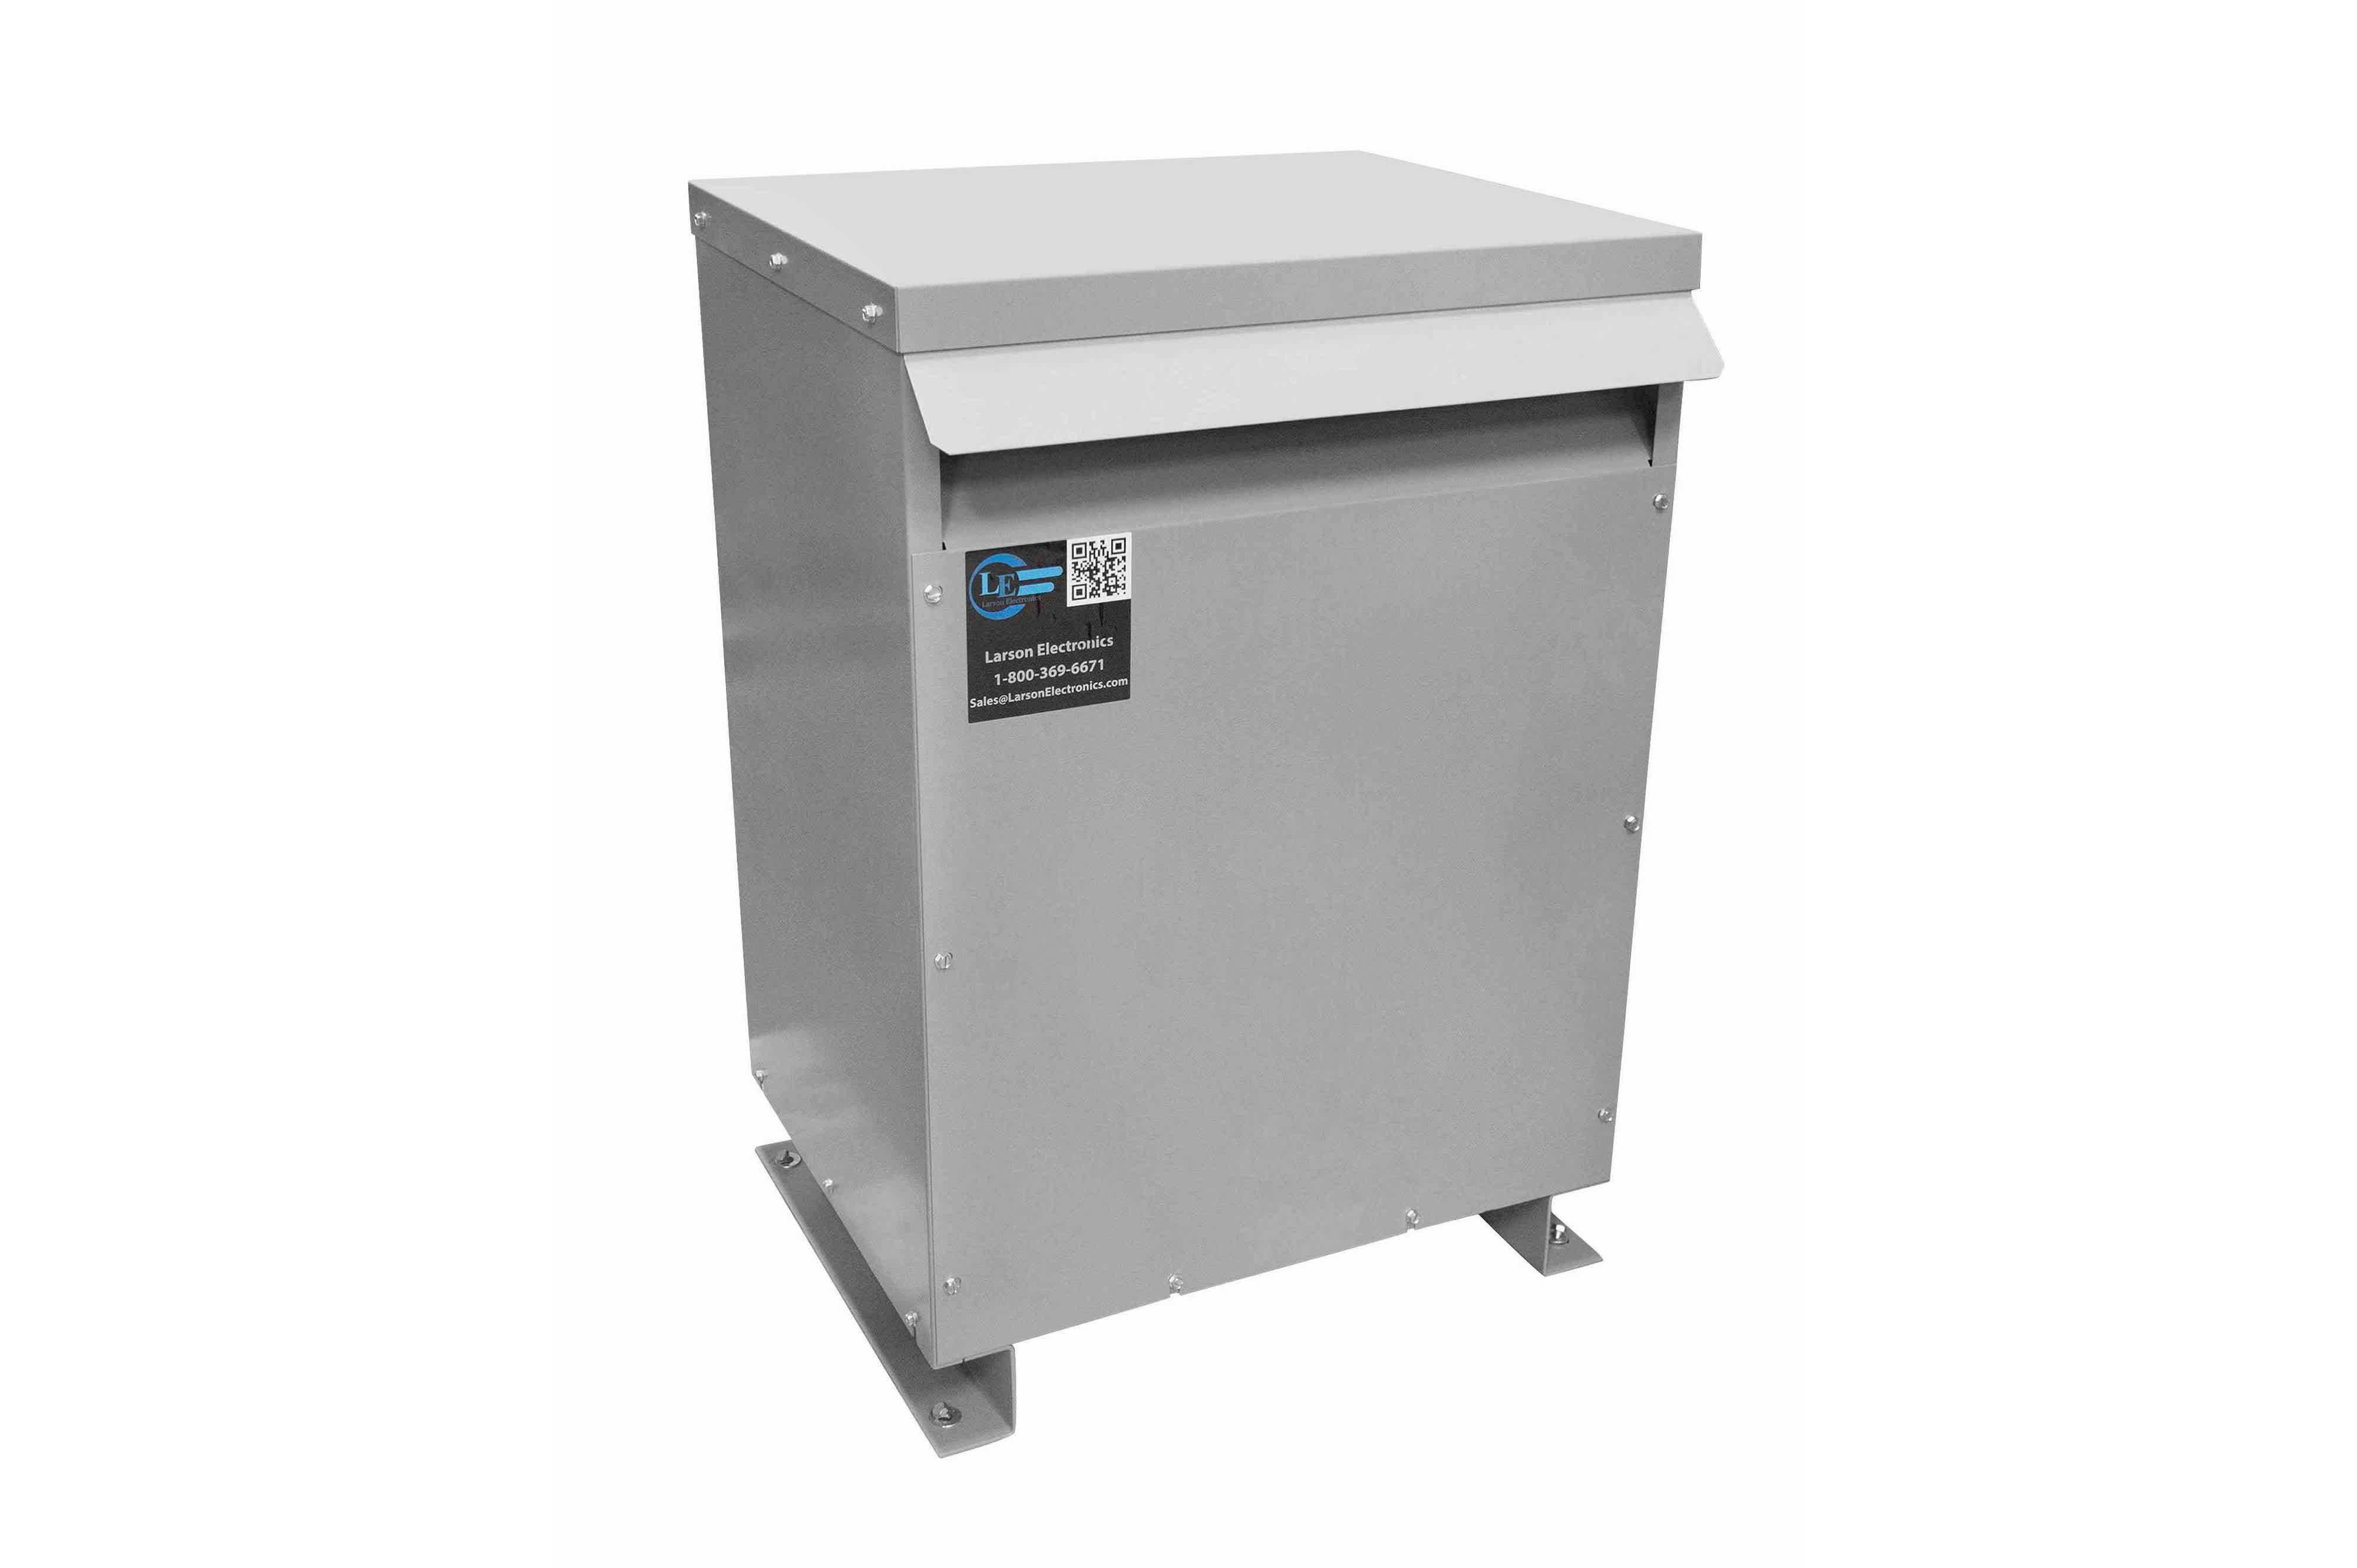 70 kVA 3PH Isolation Transformer, 240V Wye Primary, 208V Delta Secondary, N3R, Ventilated, 60 Hz